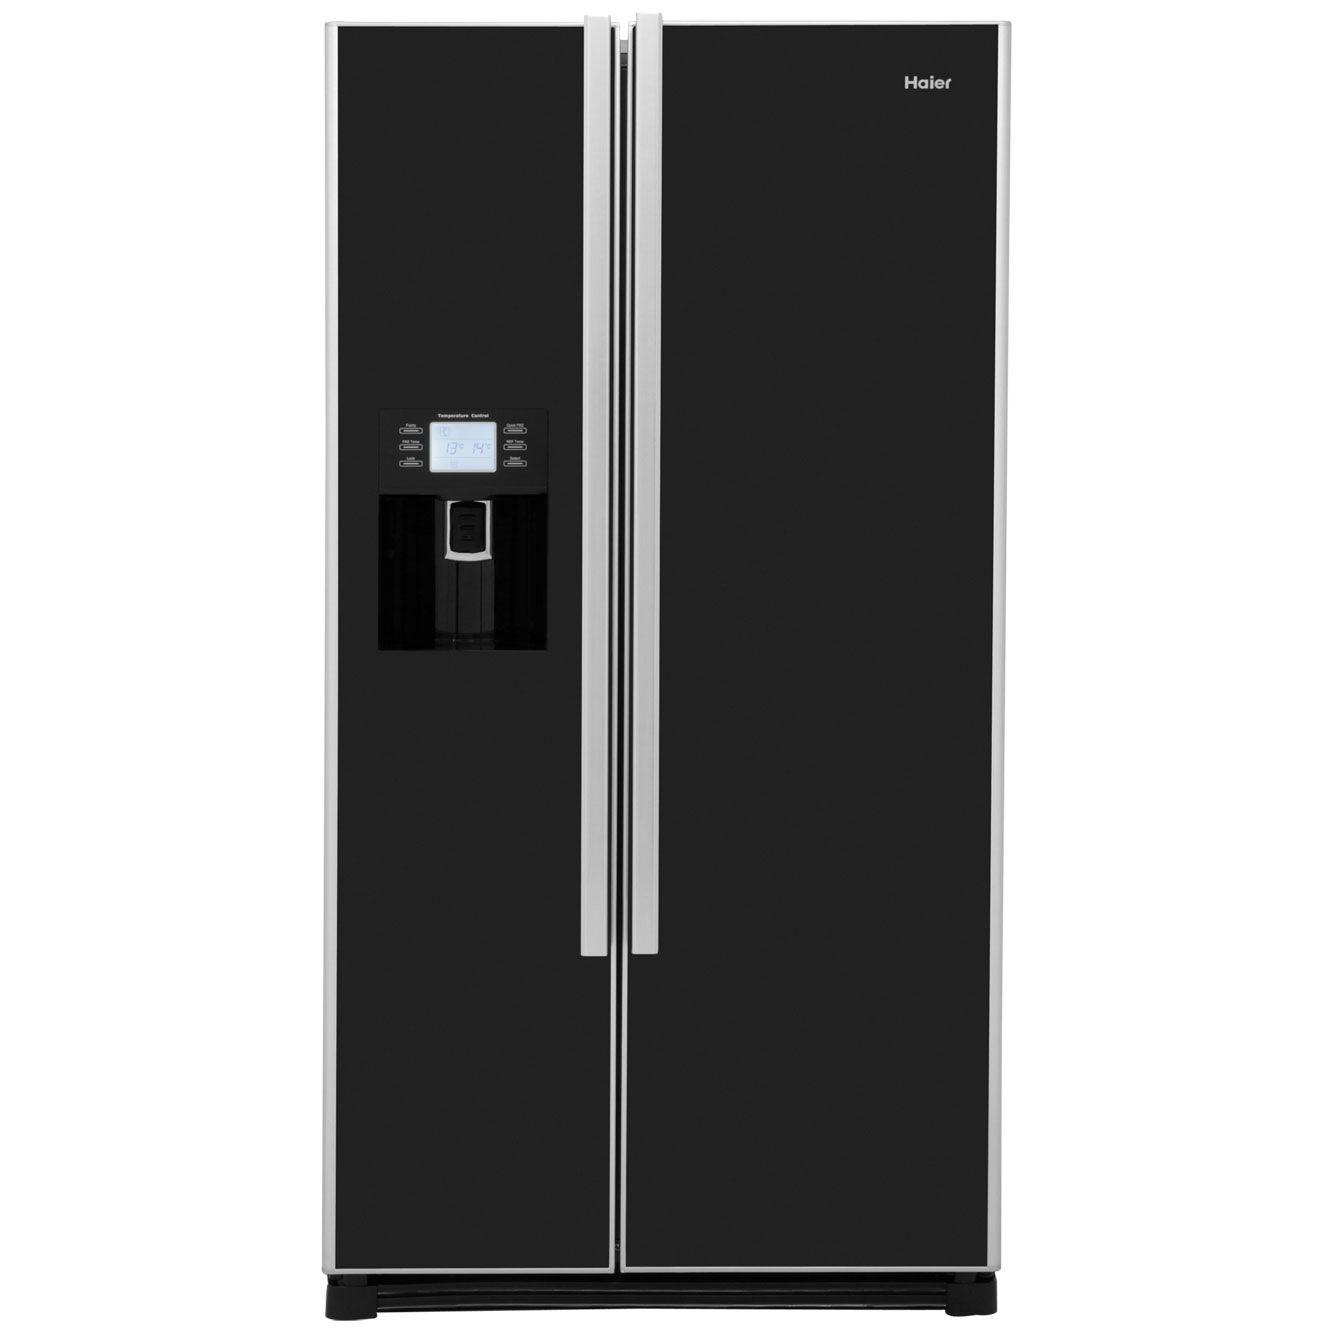 haier hrf 663cjb american fridge freezer black glass. Black Bedroom Furniture Sets. Home Design Ideas